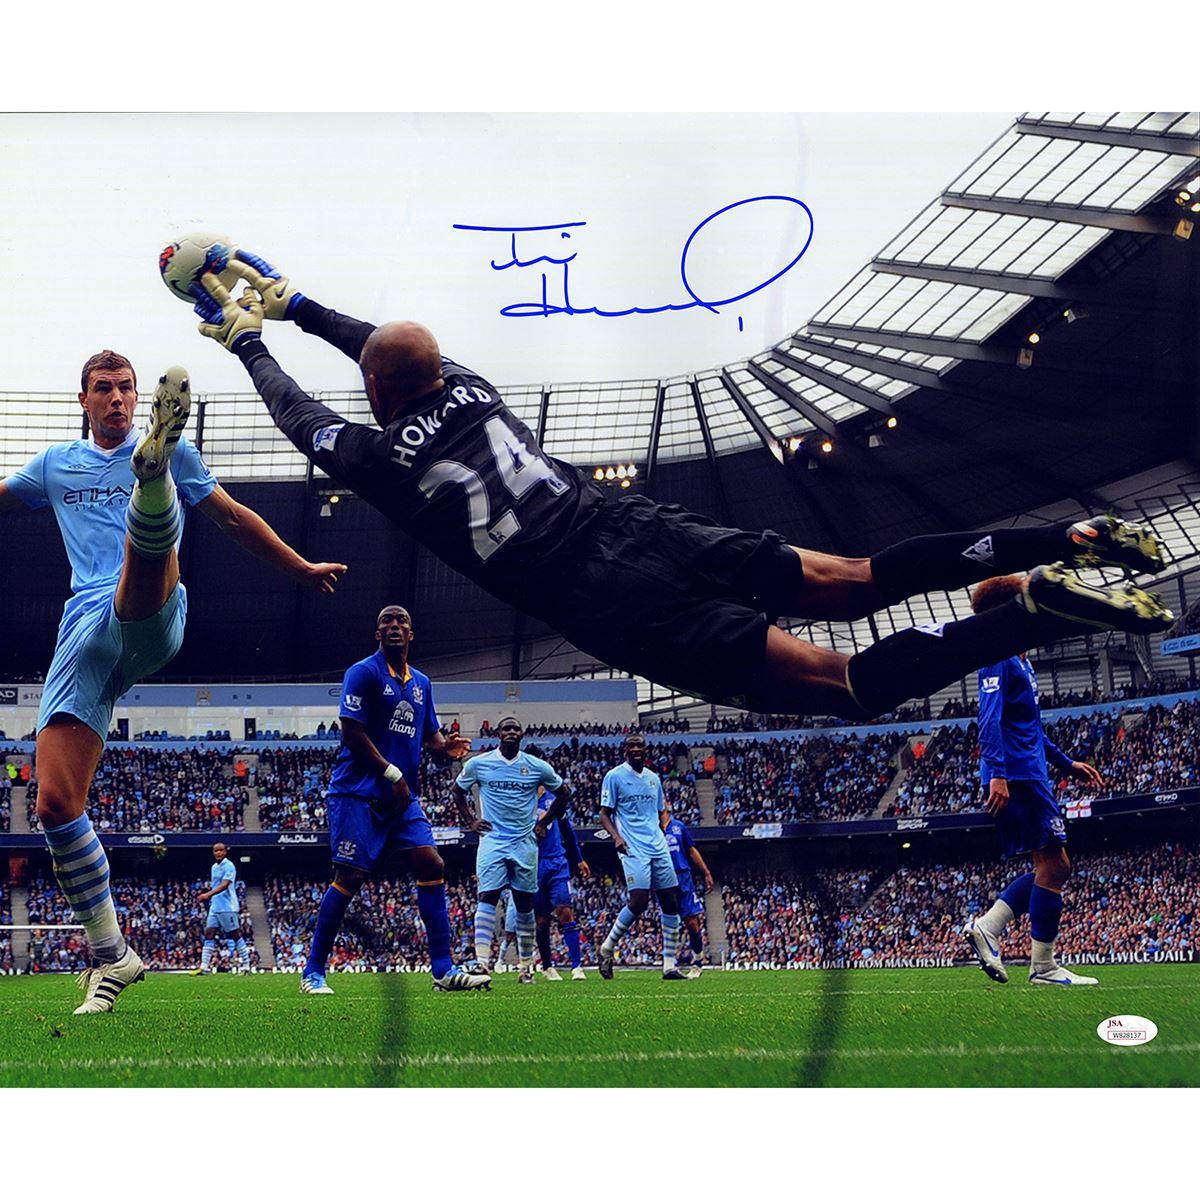 newest e9550 63ba7 Tim Howard Signed Black Jersey Everton Save 16X20 Photo ...